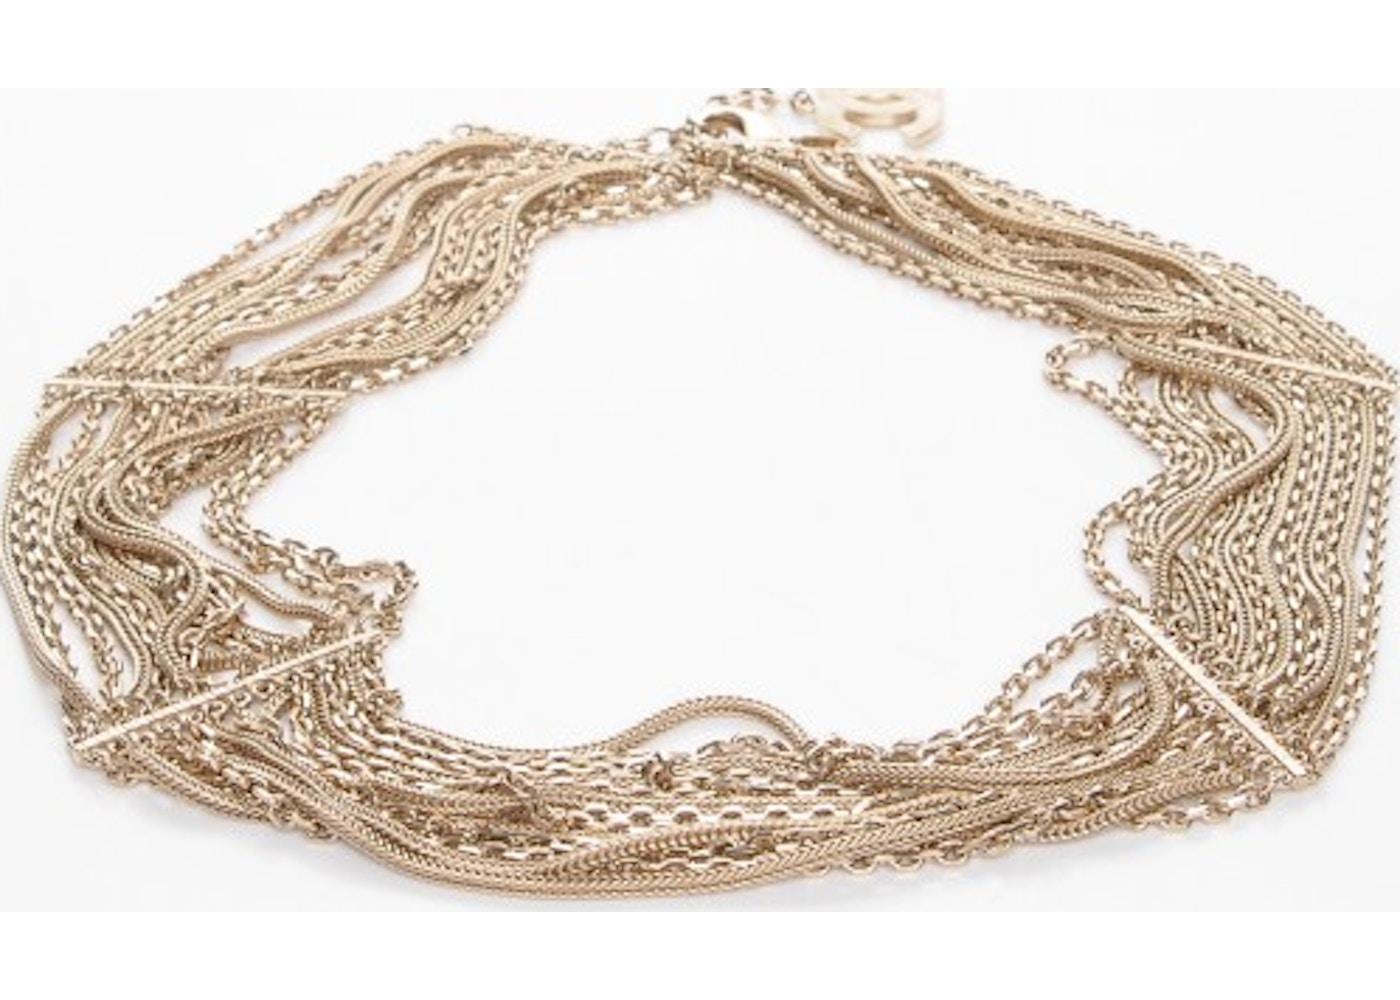 e0084b92f50 Chanel CC Waspie Belt Gold